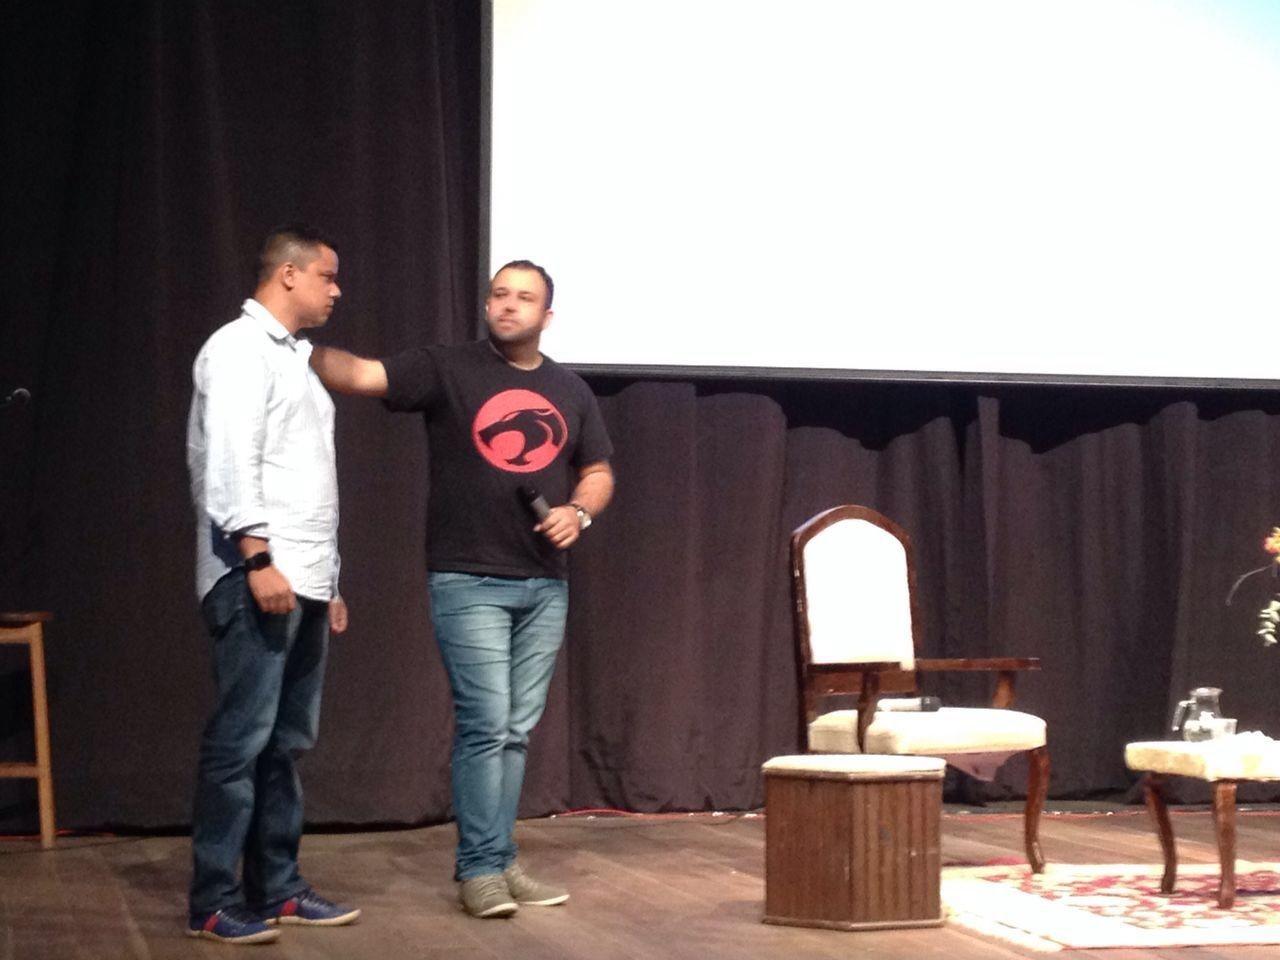 Itabuna: Evento organizado por estudantes da UNIME trouxe empreendedor conhecido mundialmente